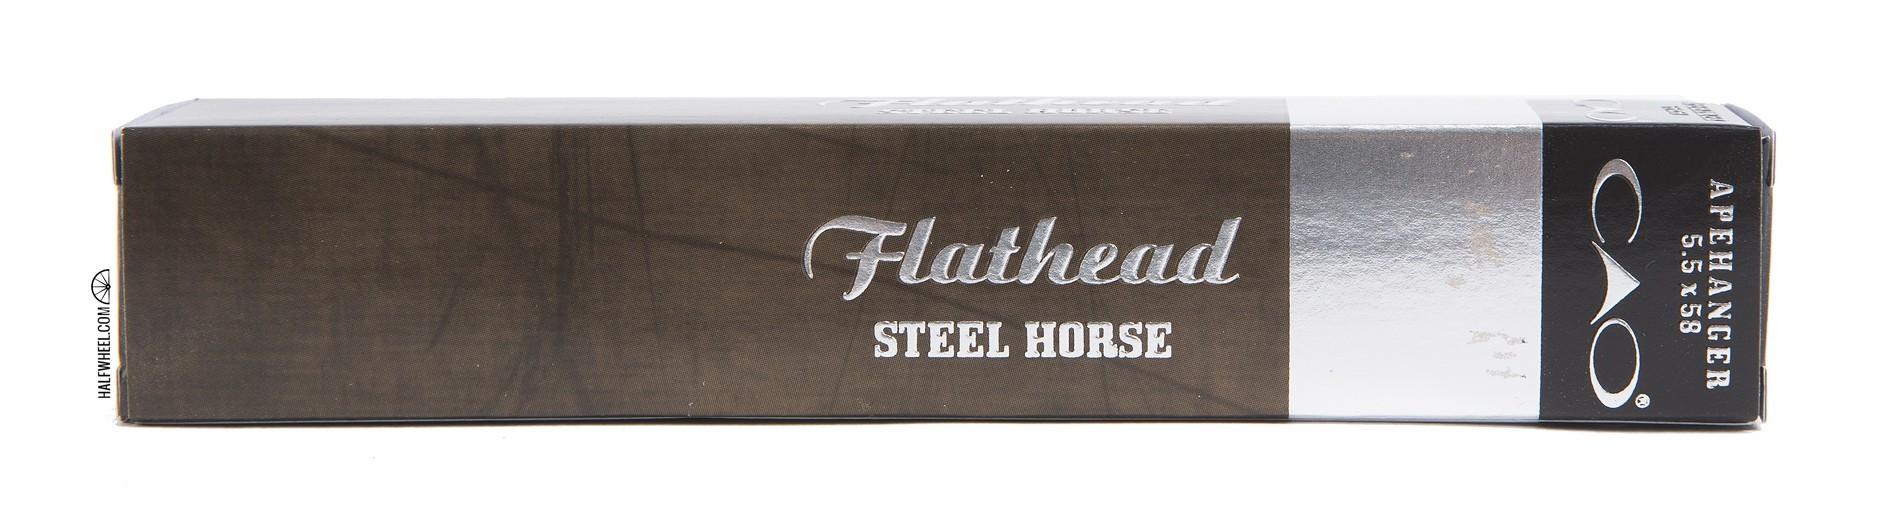 CAO Flathead Steel Horse Apehanger Coffin 1